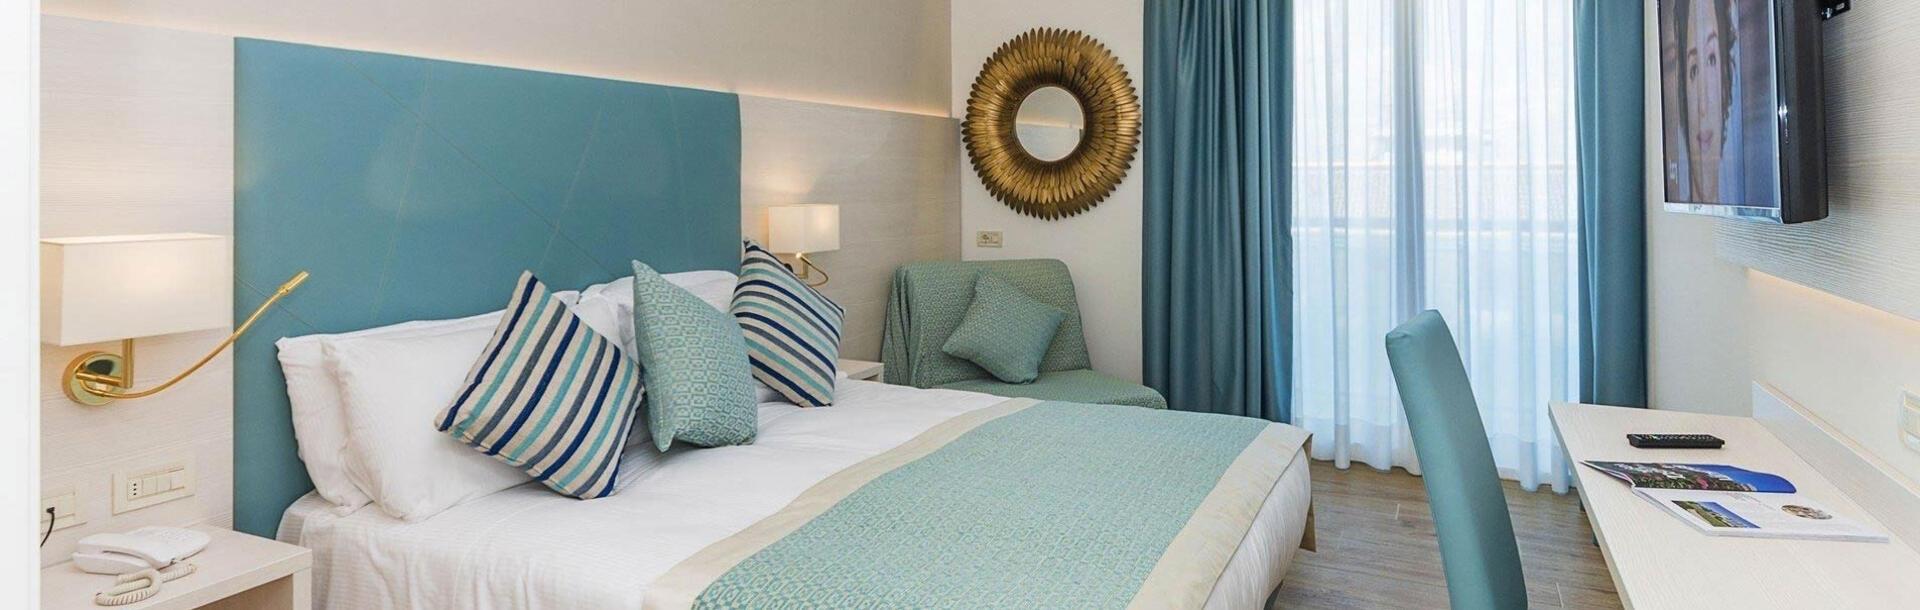 hotel-montecarlo hu hotel-lakosztallyal-bibione 014